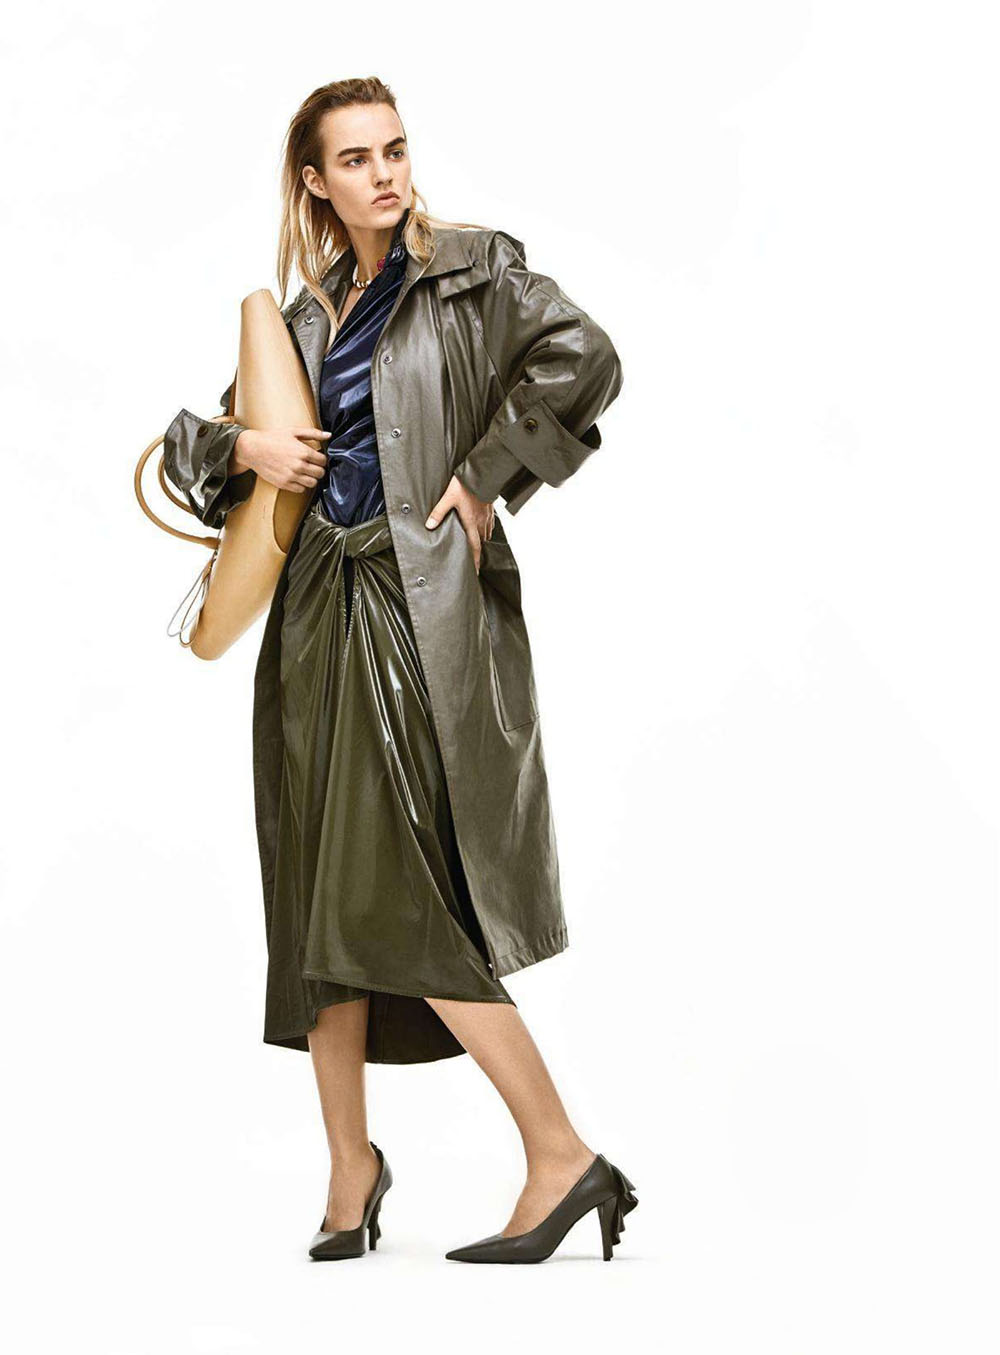 Maartje Verhoef by Johnny Kangasniemi for Harper's Bazaar Germany April 2019